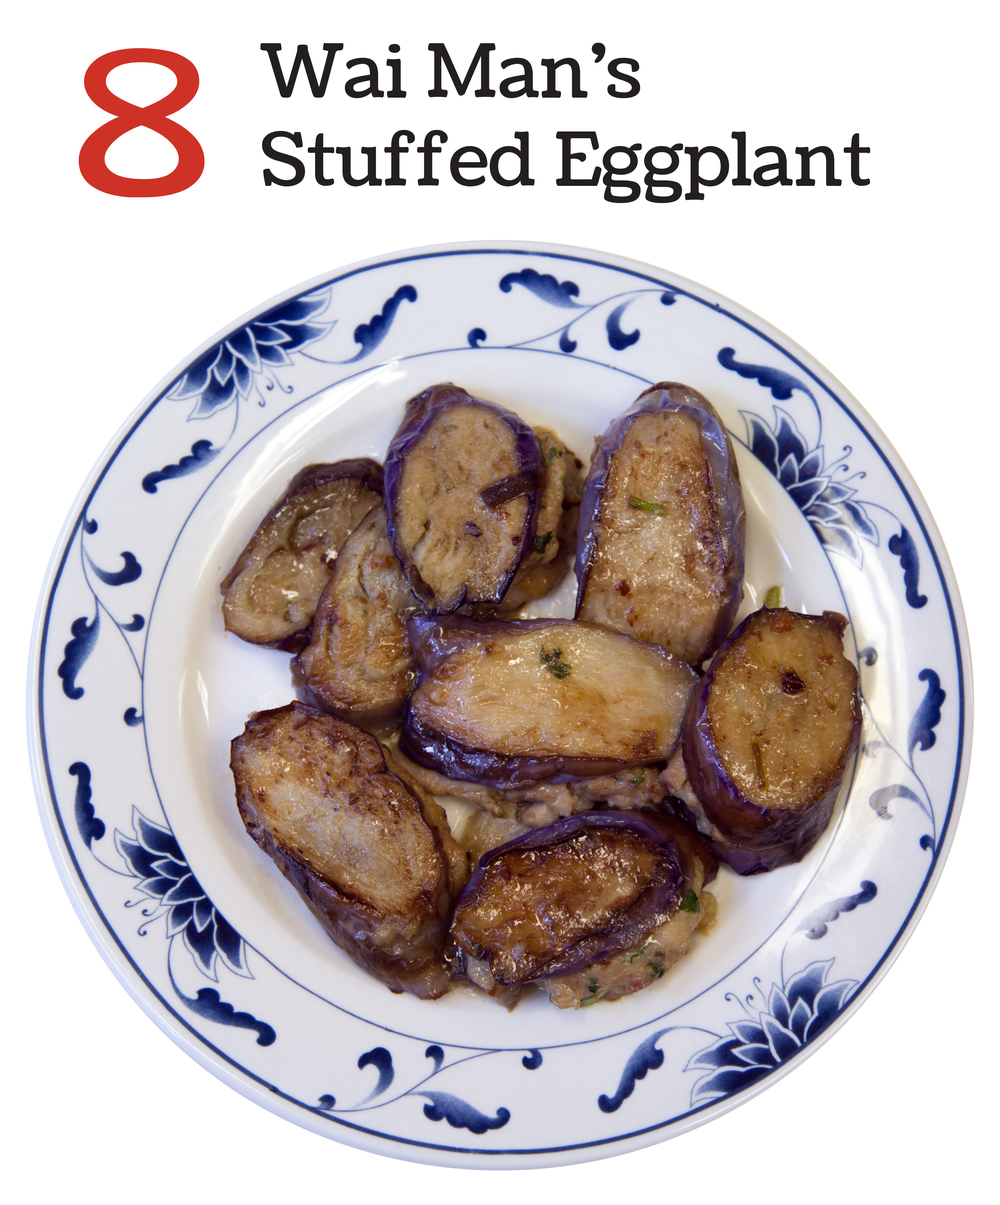 8 Wai Man's Stuffed Eggplant.jpg